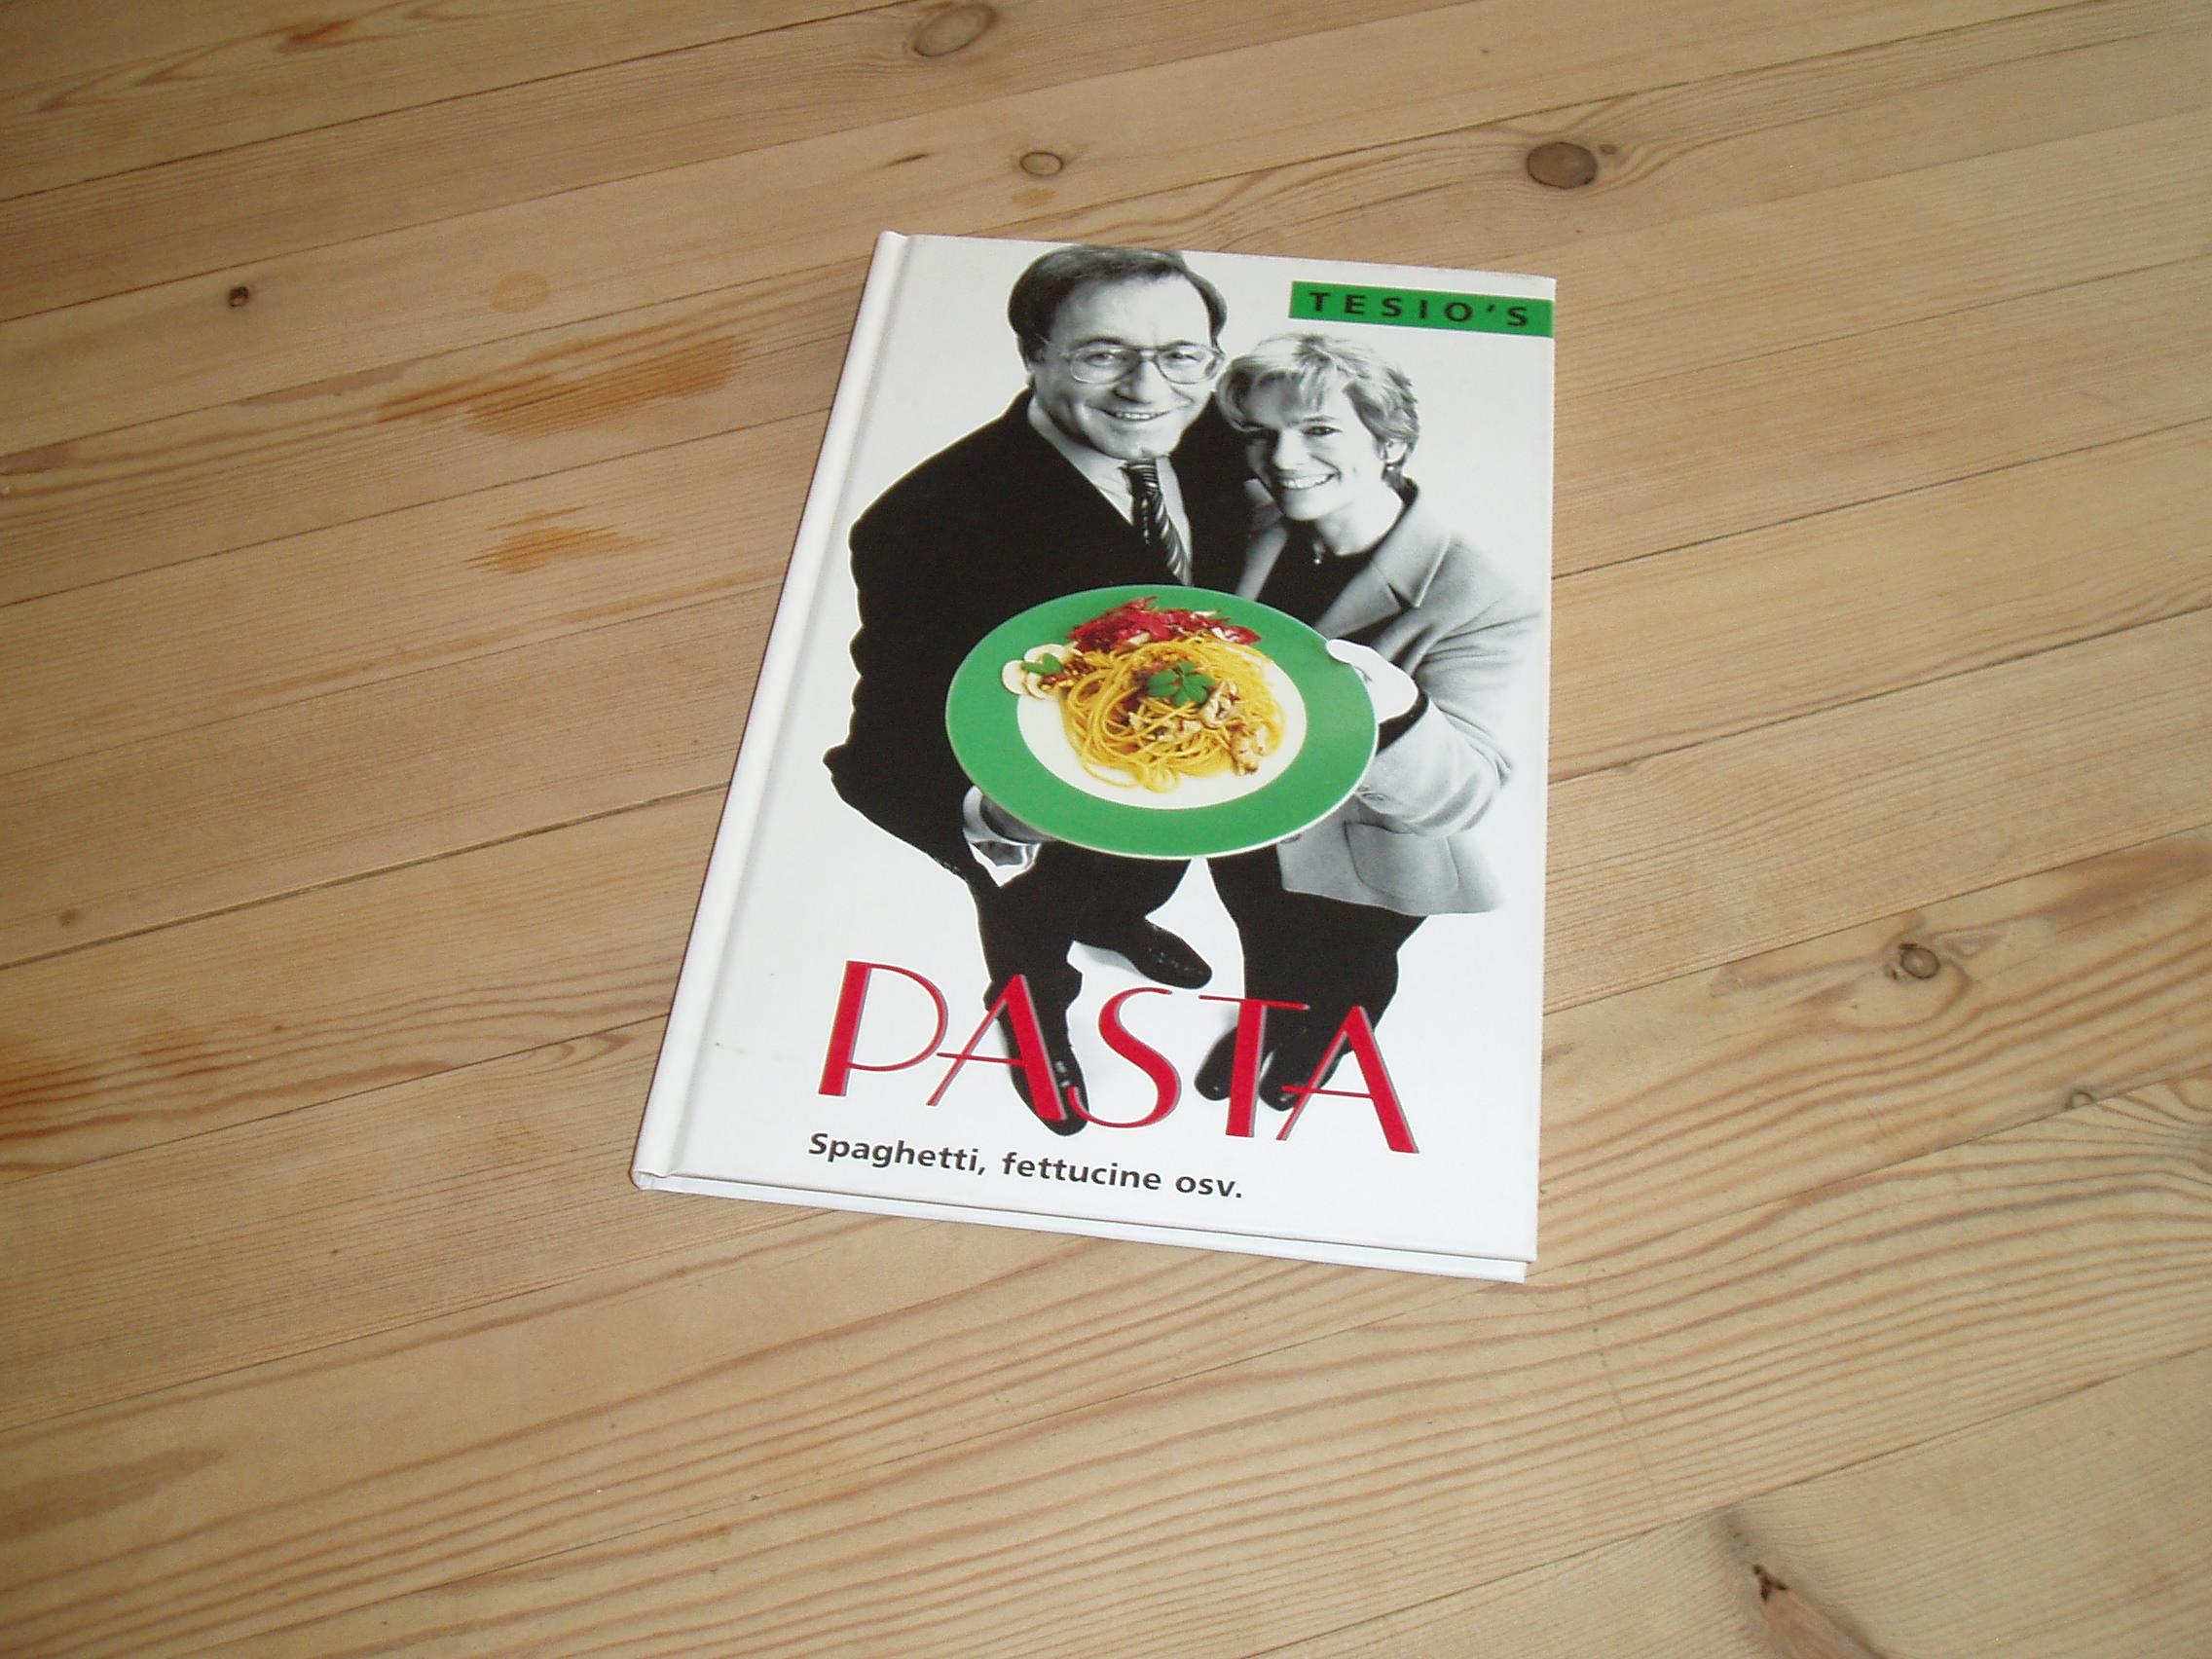 Tesio's pasta